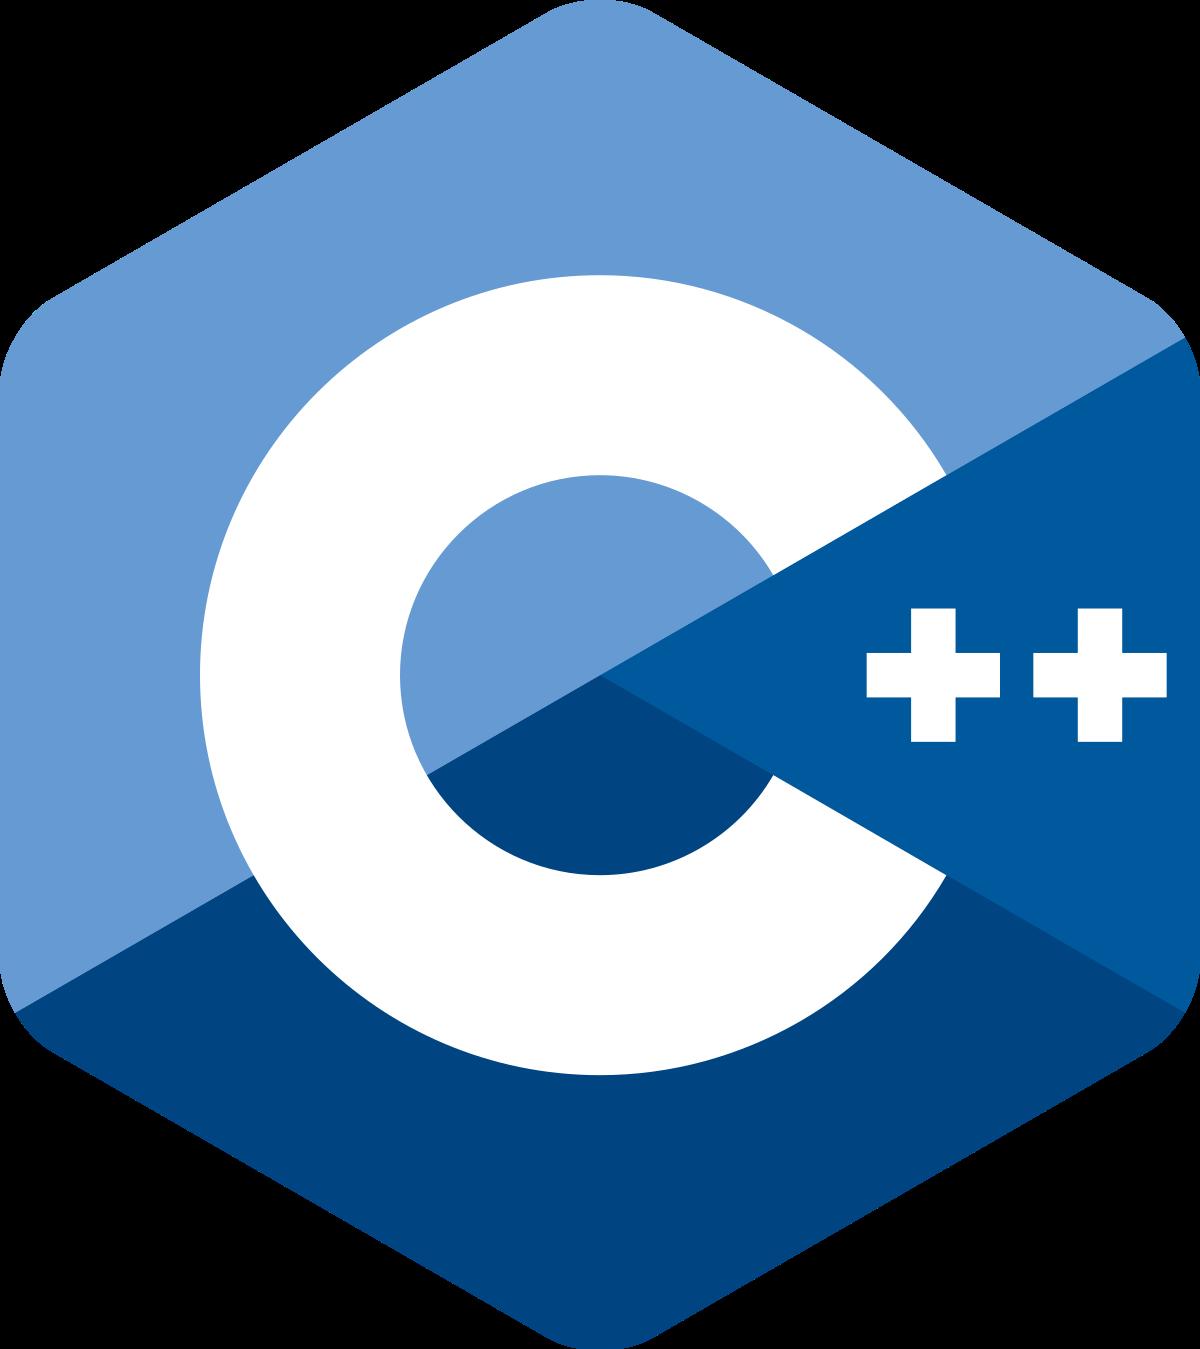 subject C++